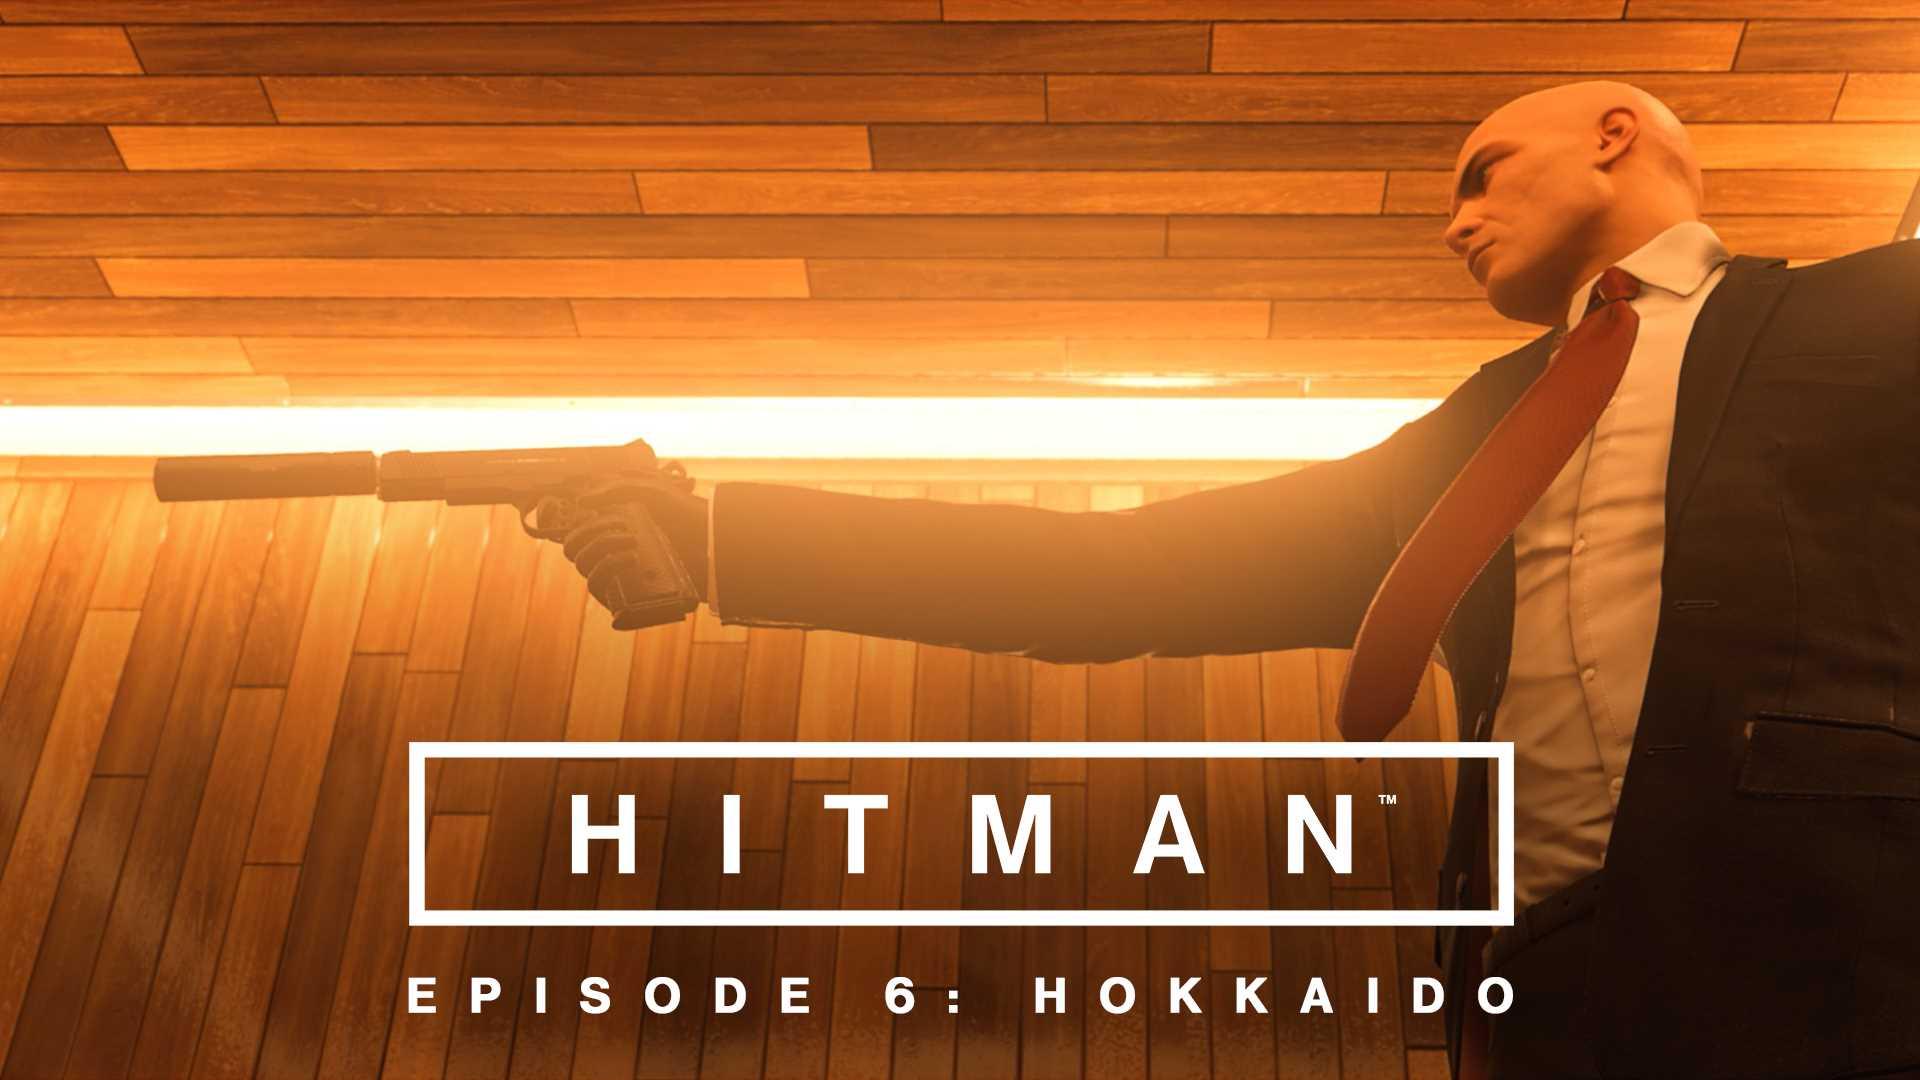 Hitman Episode 6 Hokkaido Review Godisageek Com